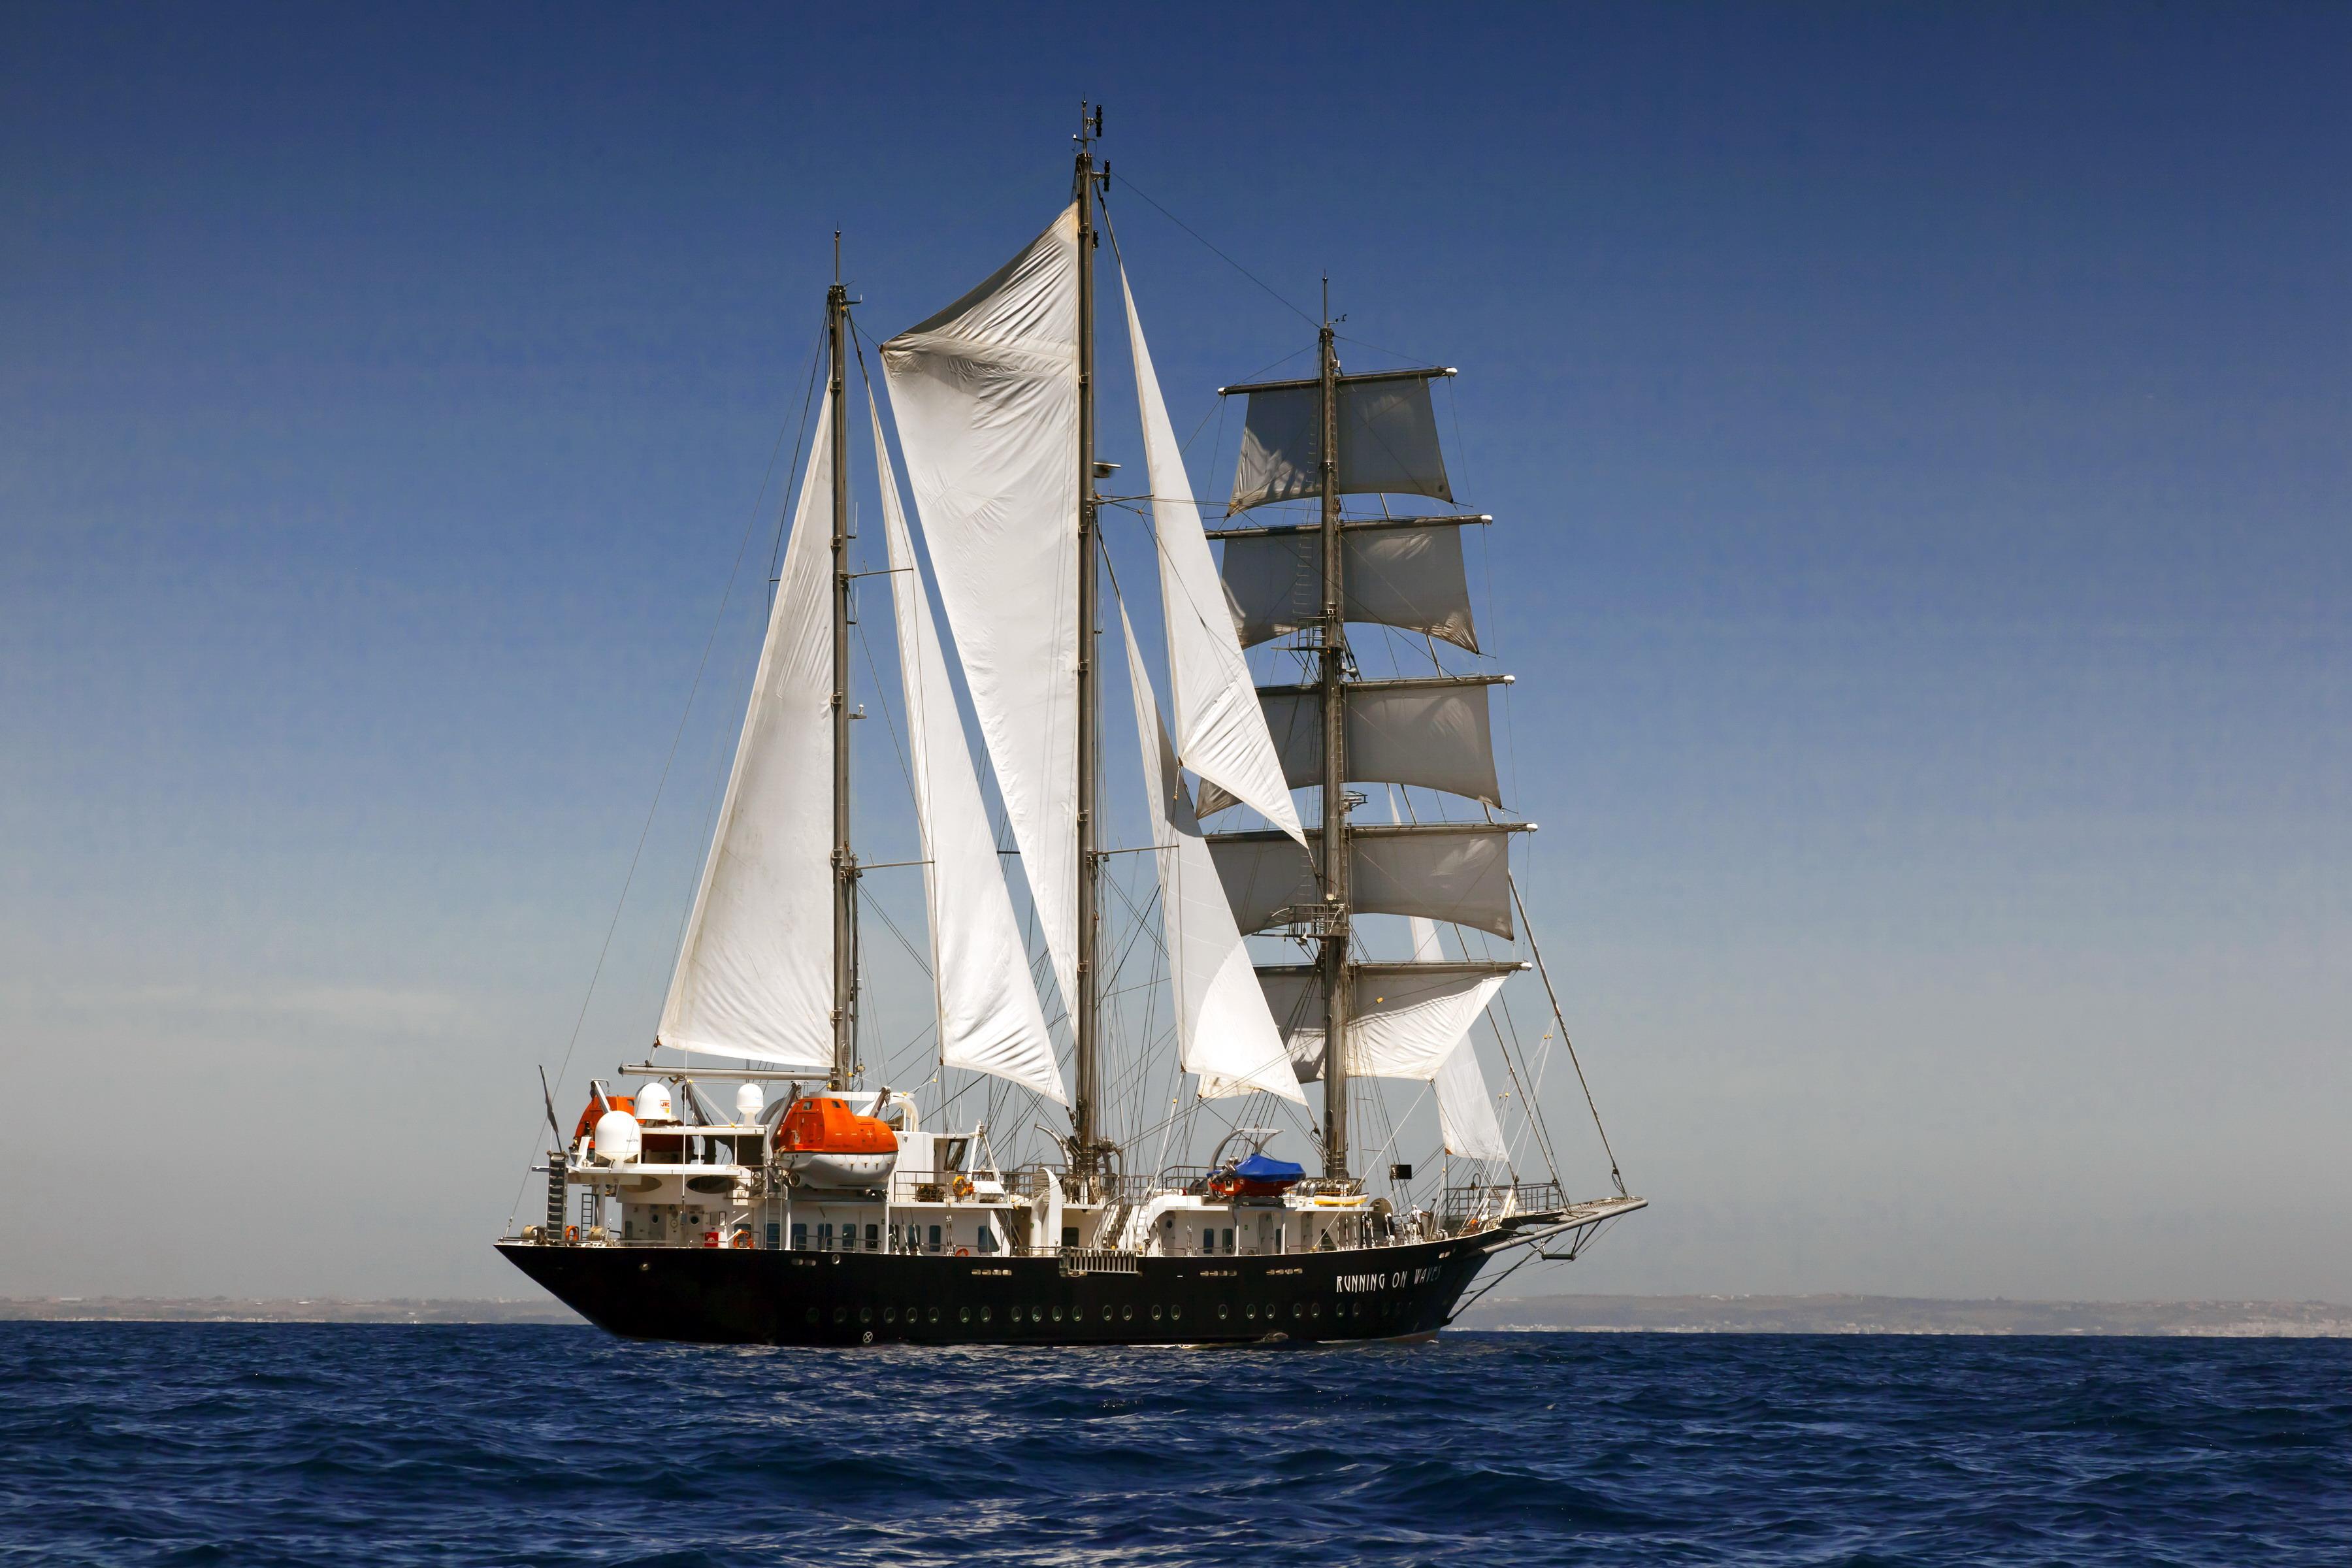 парусник, корабль, океан